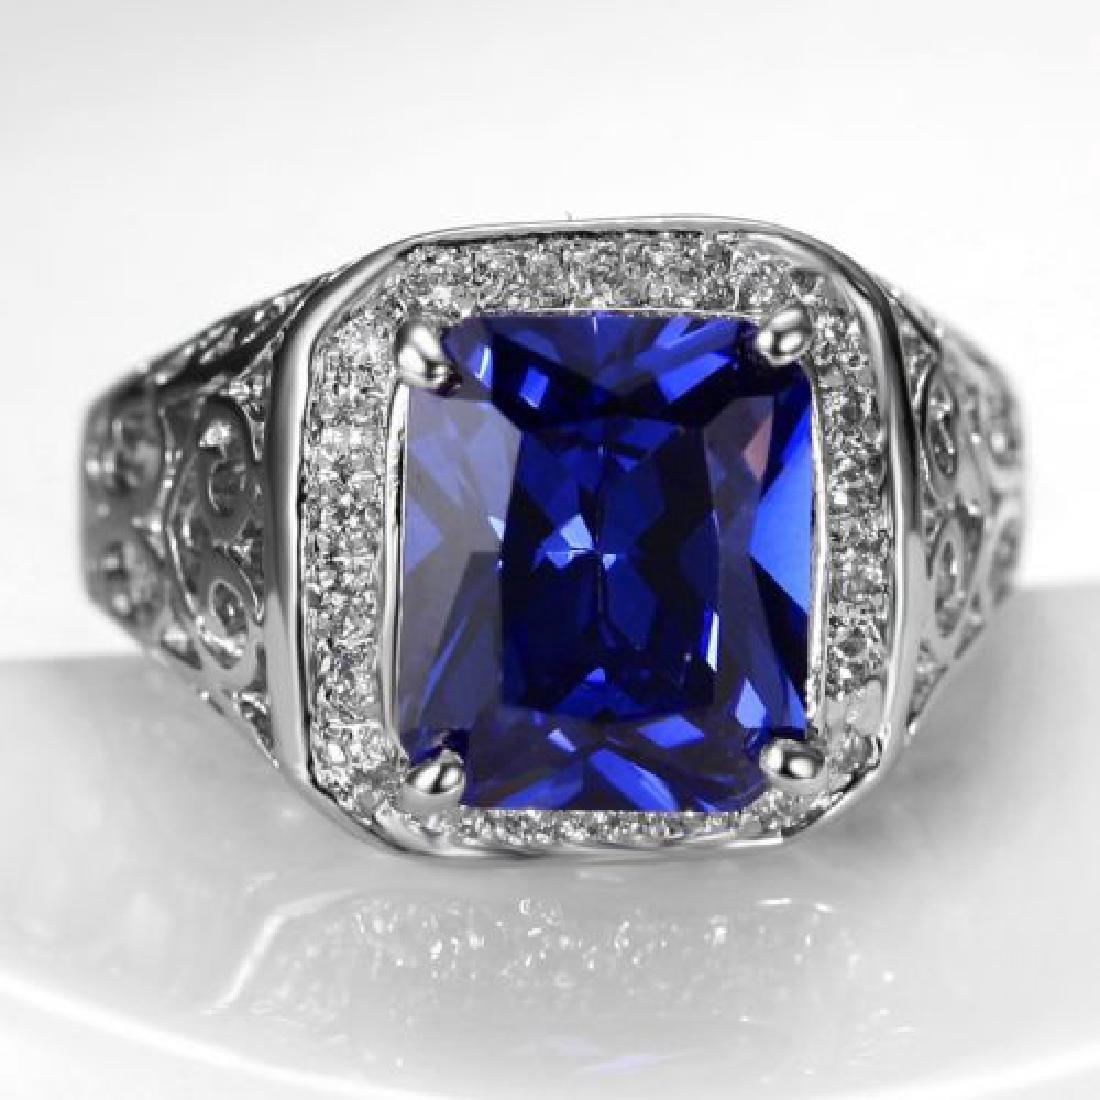 14K White Gold Sapphire Ring, 5.15 ct